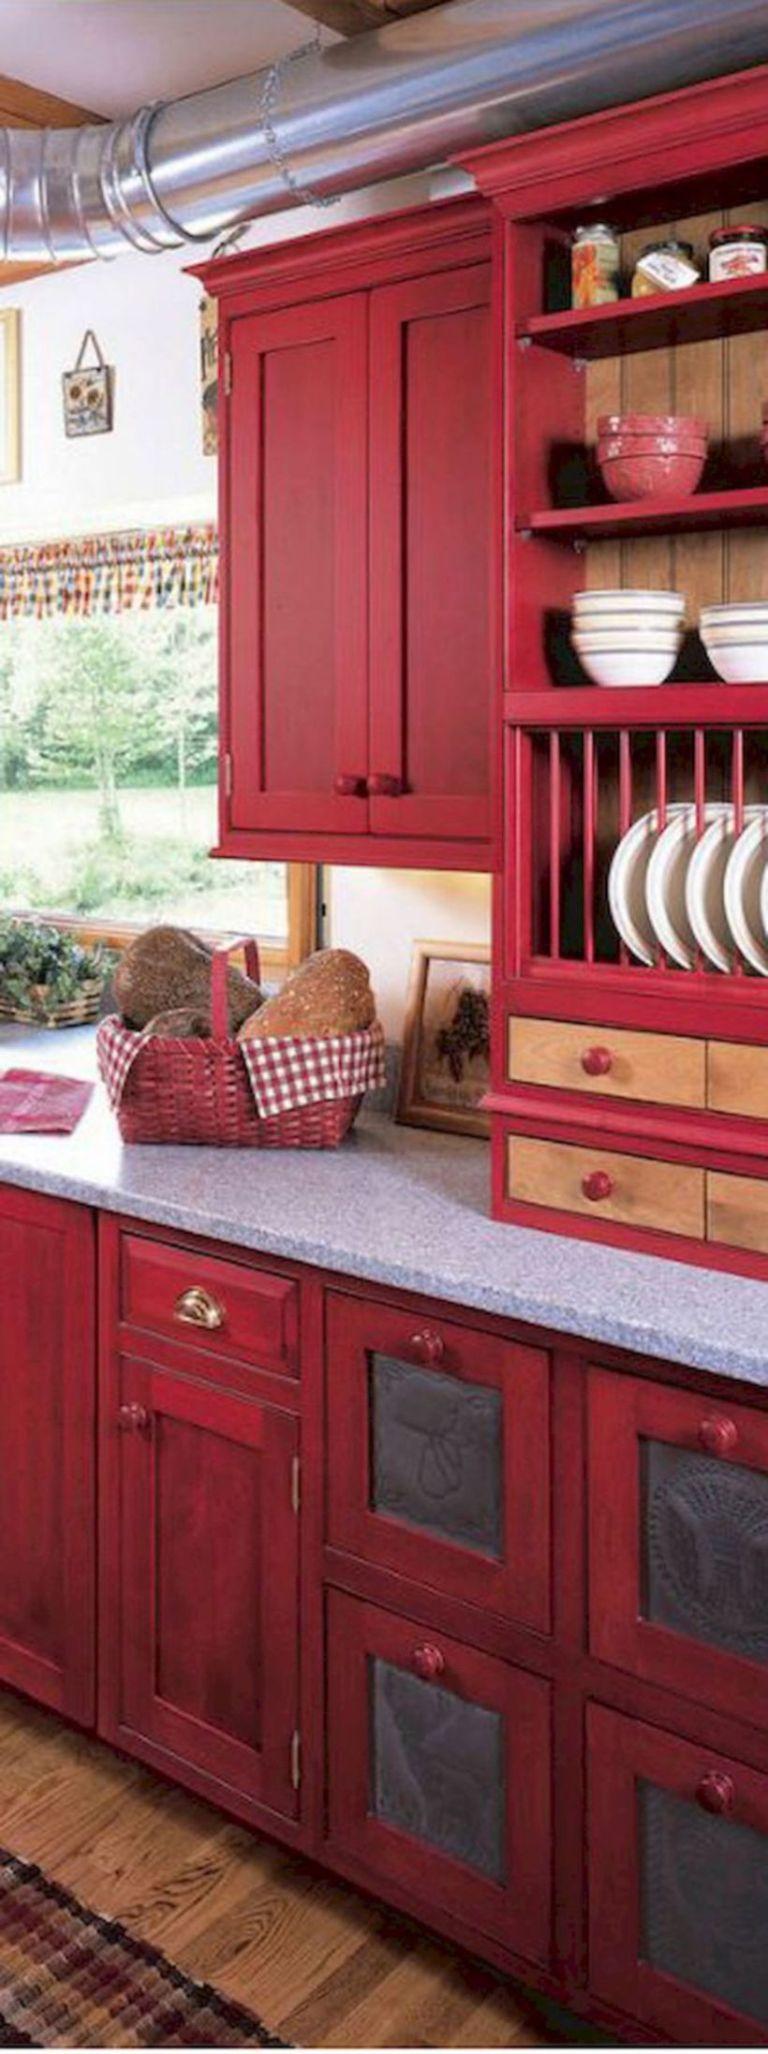 Stunning Christmas Kitchen Décoration Ideas 49 49 | Rustic ...